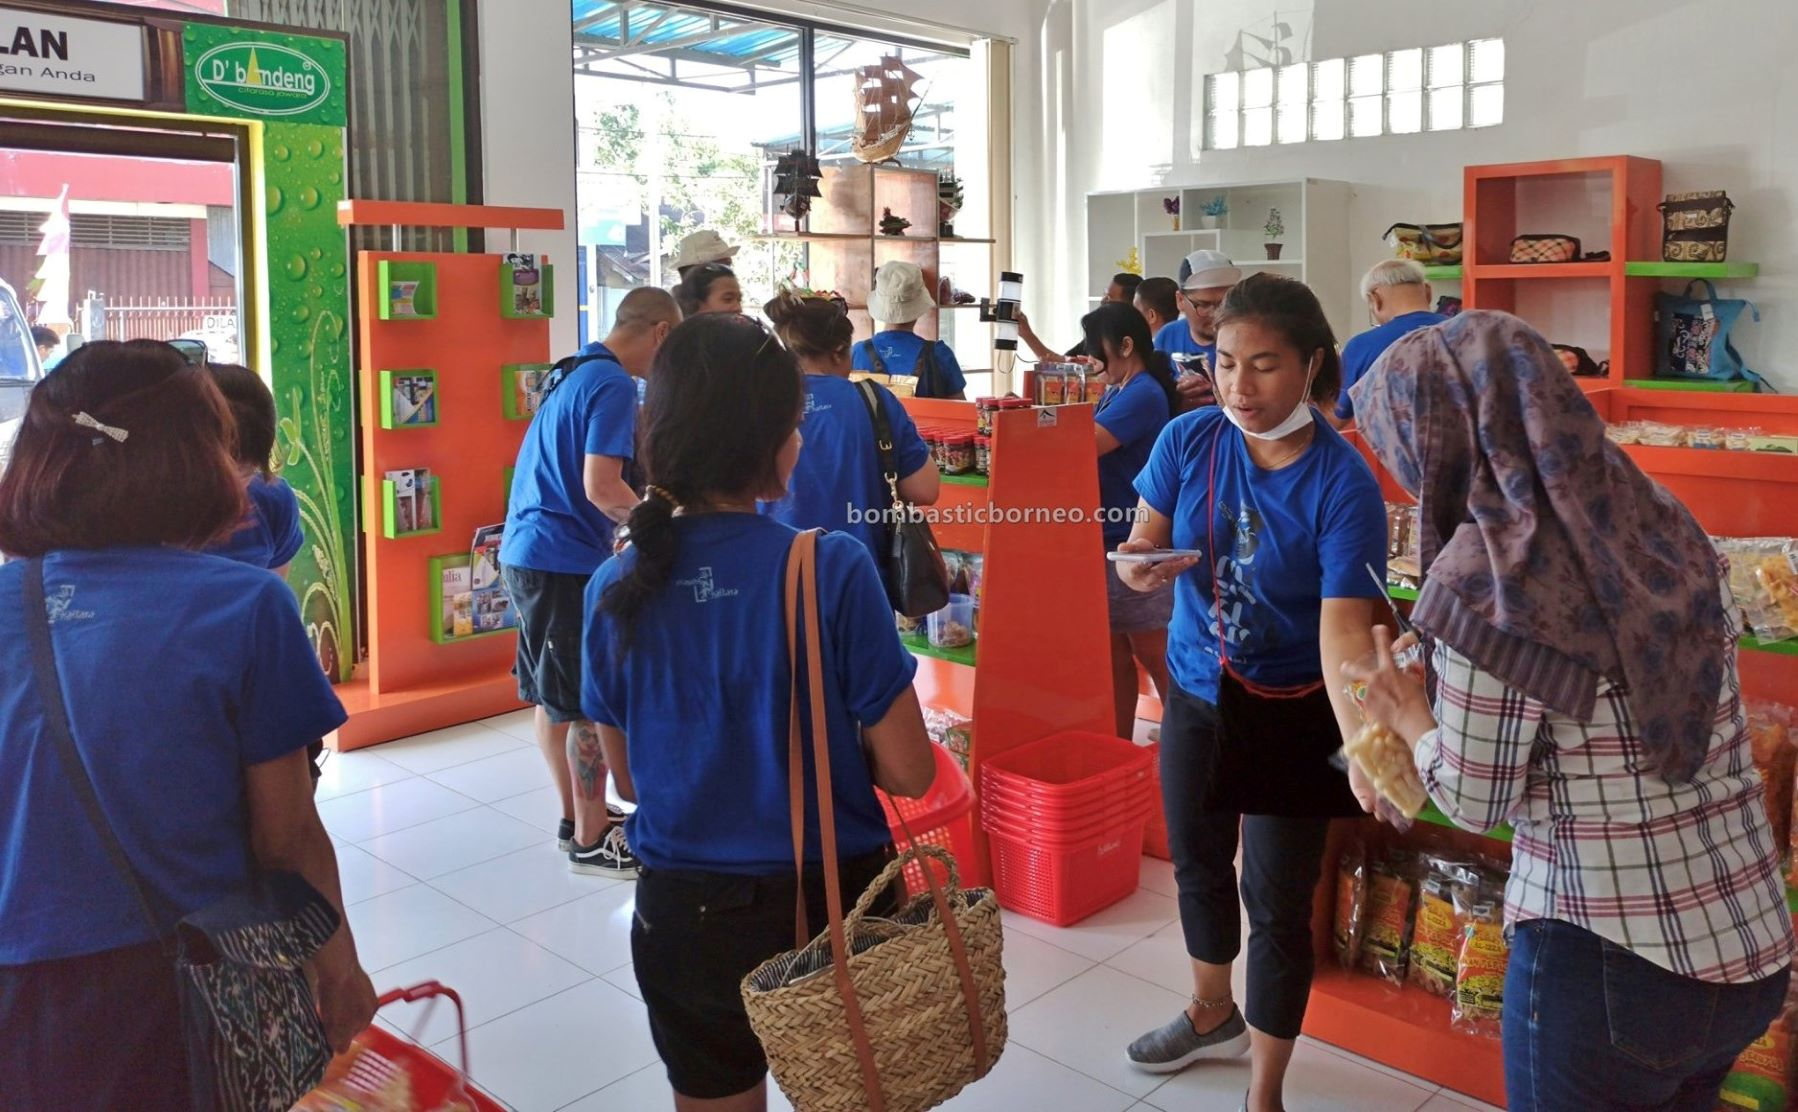 local products, backpackers, destination, exploration, Indonesia, Obyek wisata, Tourist attraction, tourism, travel guide, Borneo, trans border, cross border, 印尼北加里曼丹, 打拉根岛旅游景点,